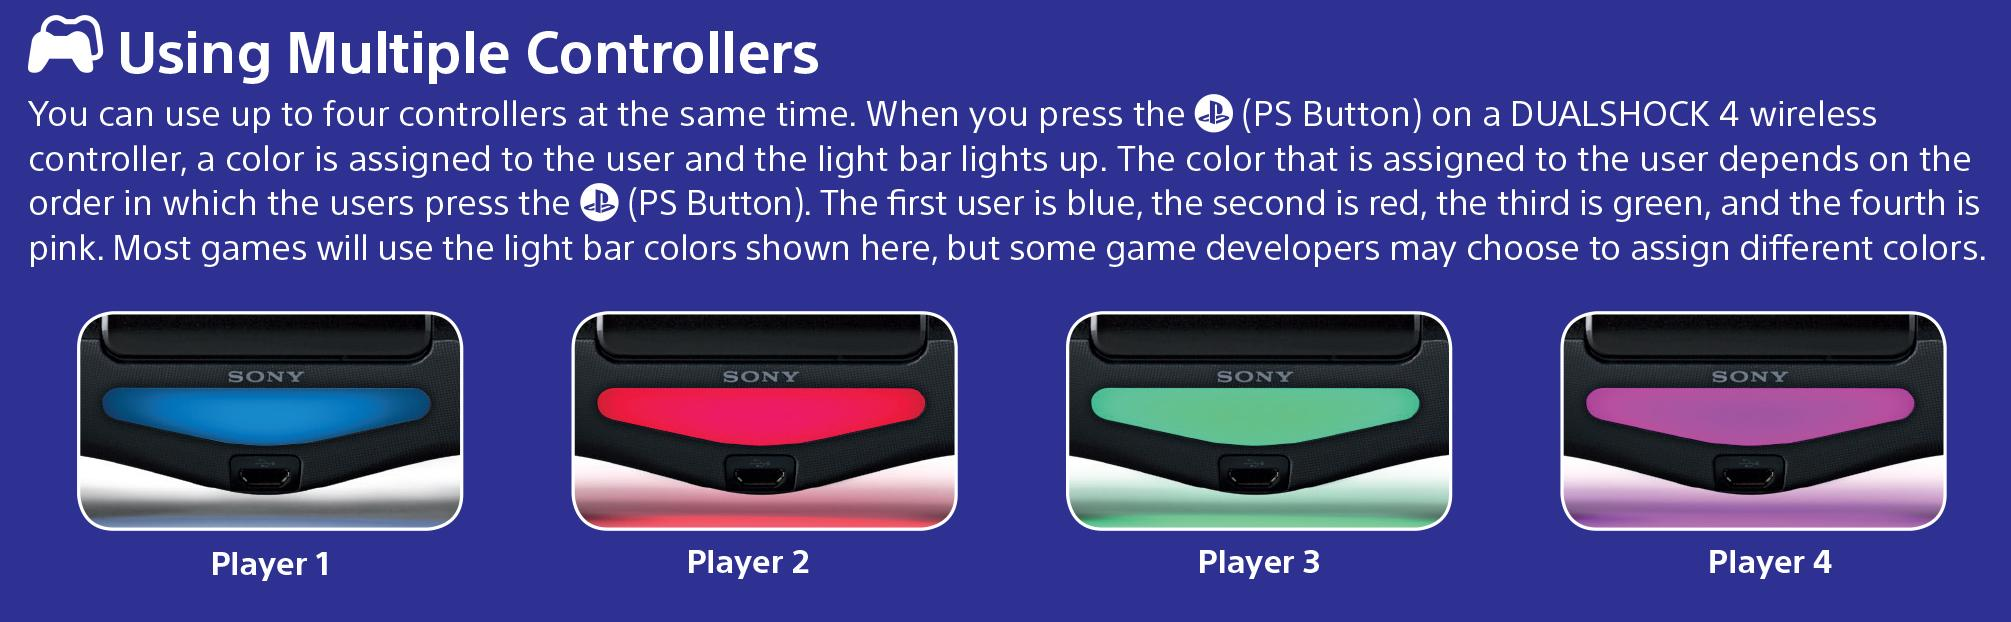 Amazon dualshock 4 wireless controller for playstation 4 dualshockds4ps4playstationcolorslightsmultiplayeruncharted aloadofball Choice Image